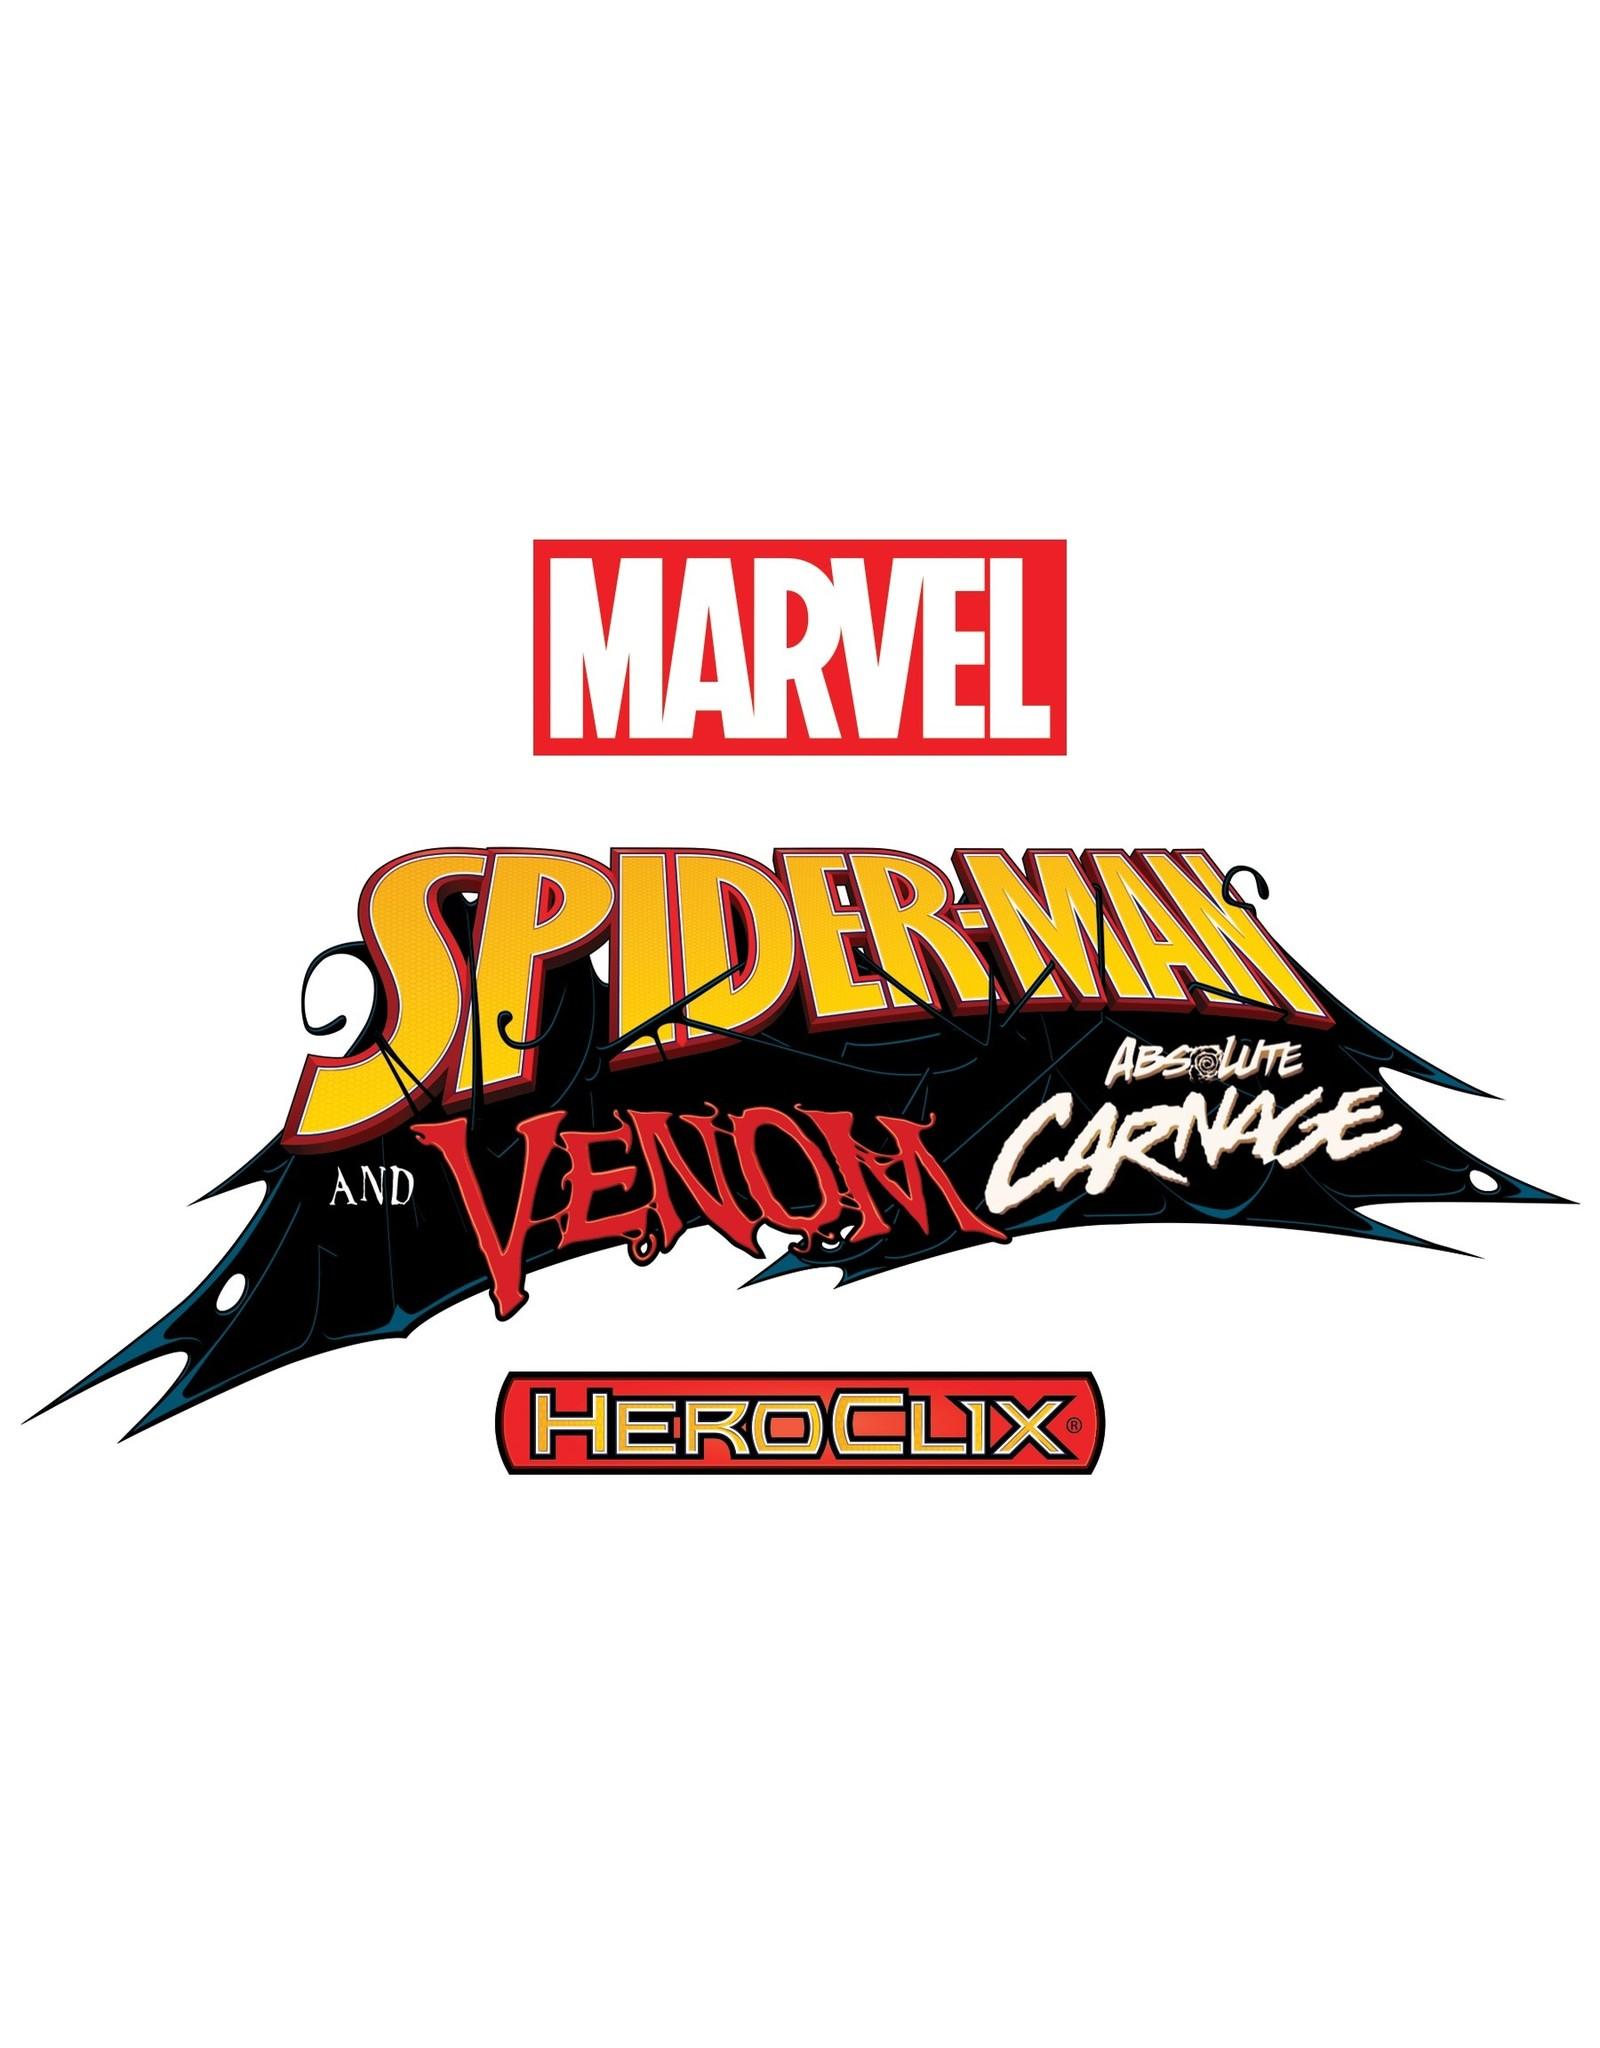 WizKids Marvel HeroClix: Spider-Man and Venom Absolute Carnage Fast Forces